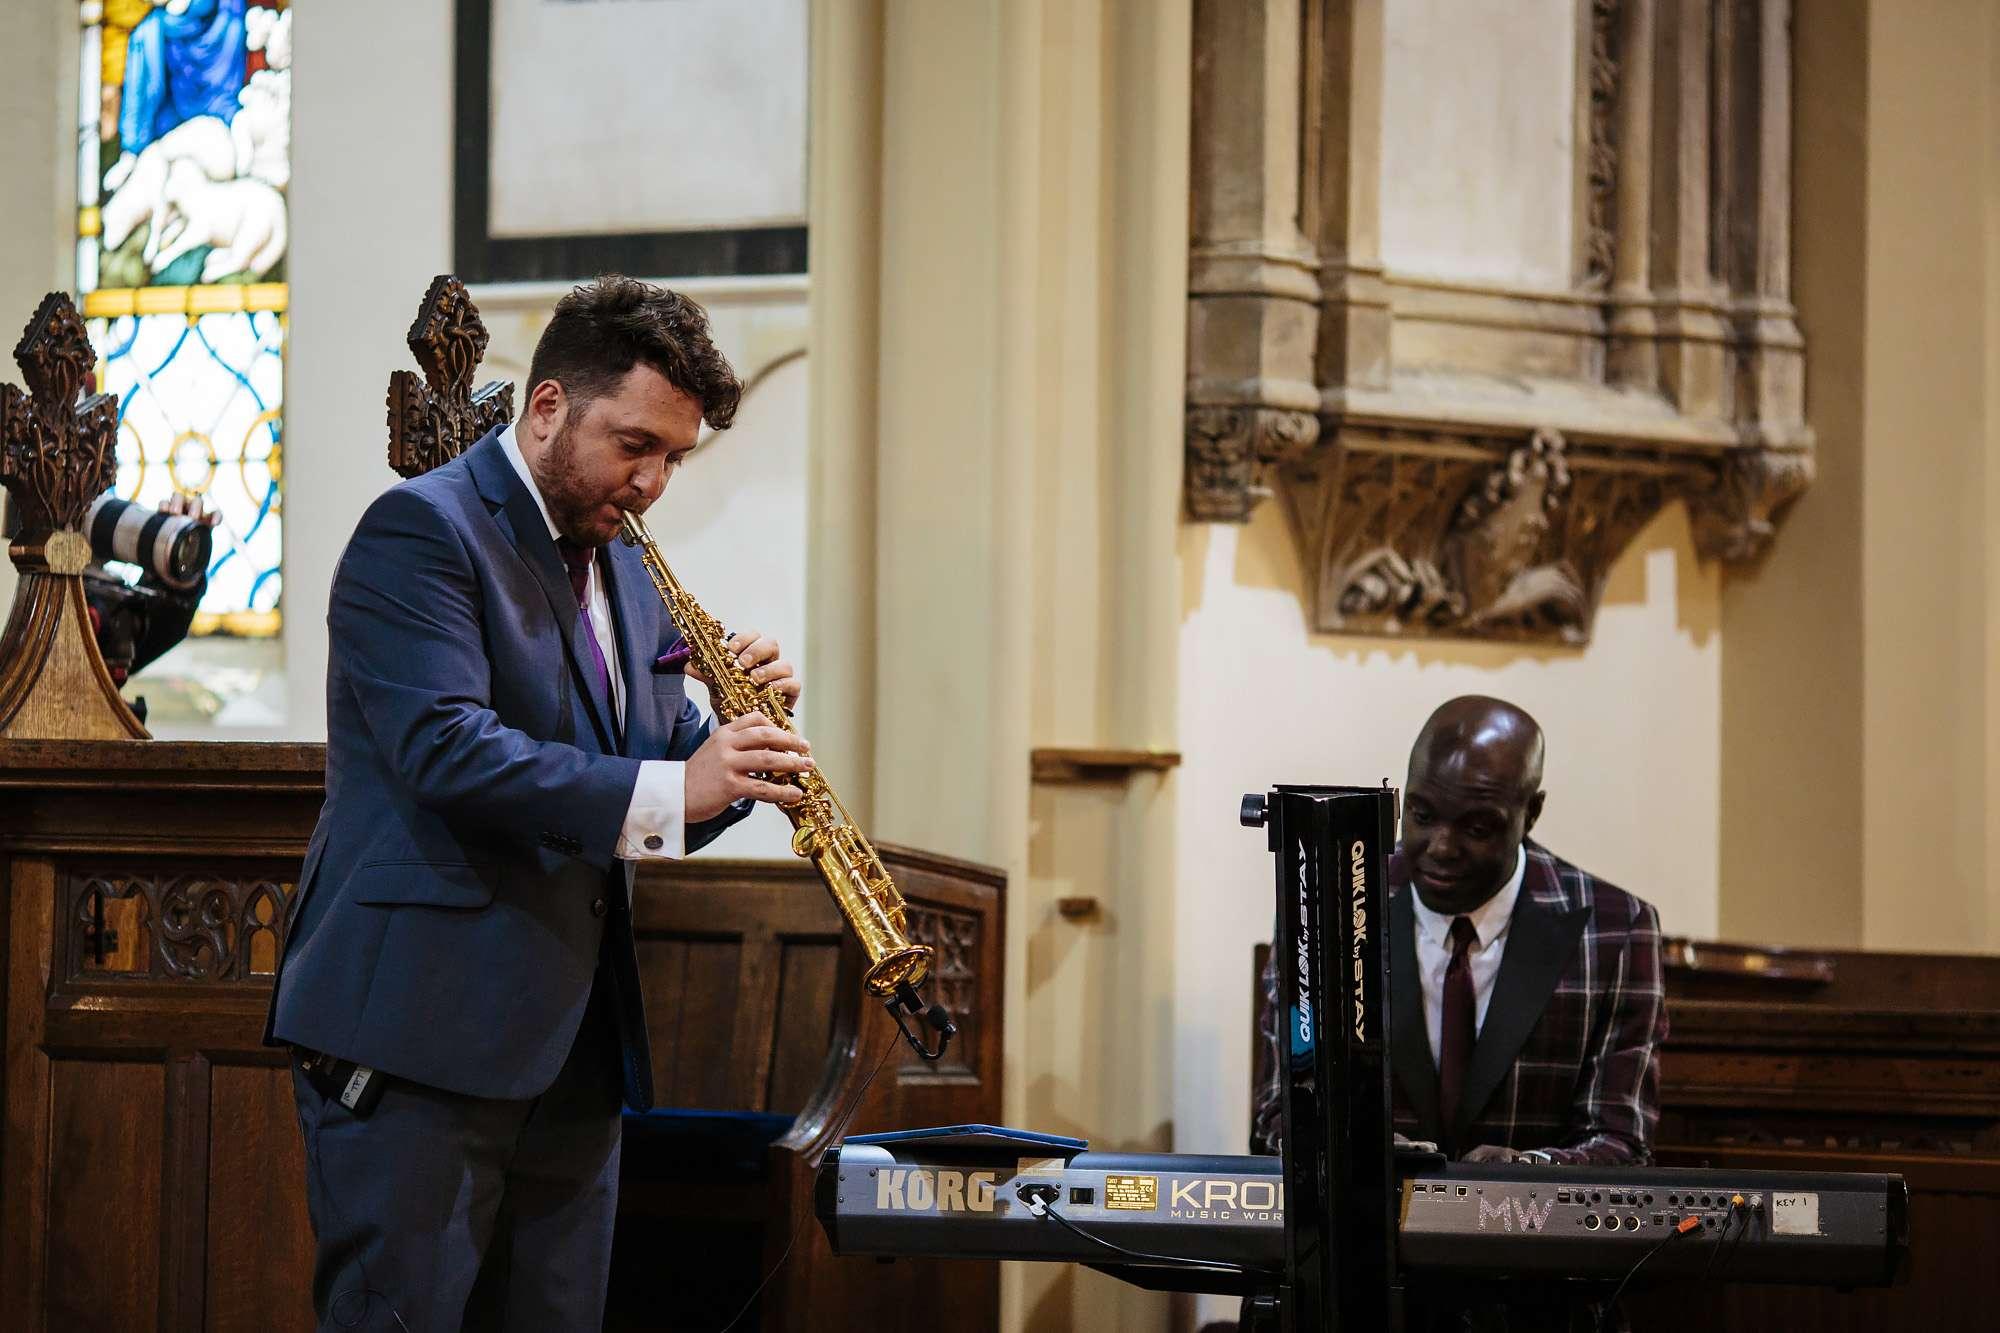 Saxophone and piano duo play at a Blackpool church wedding